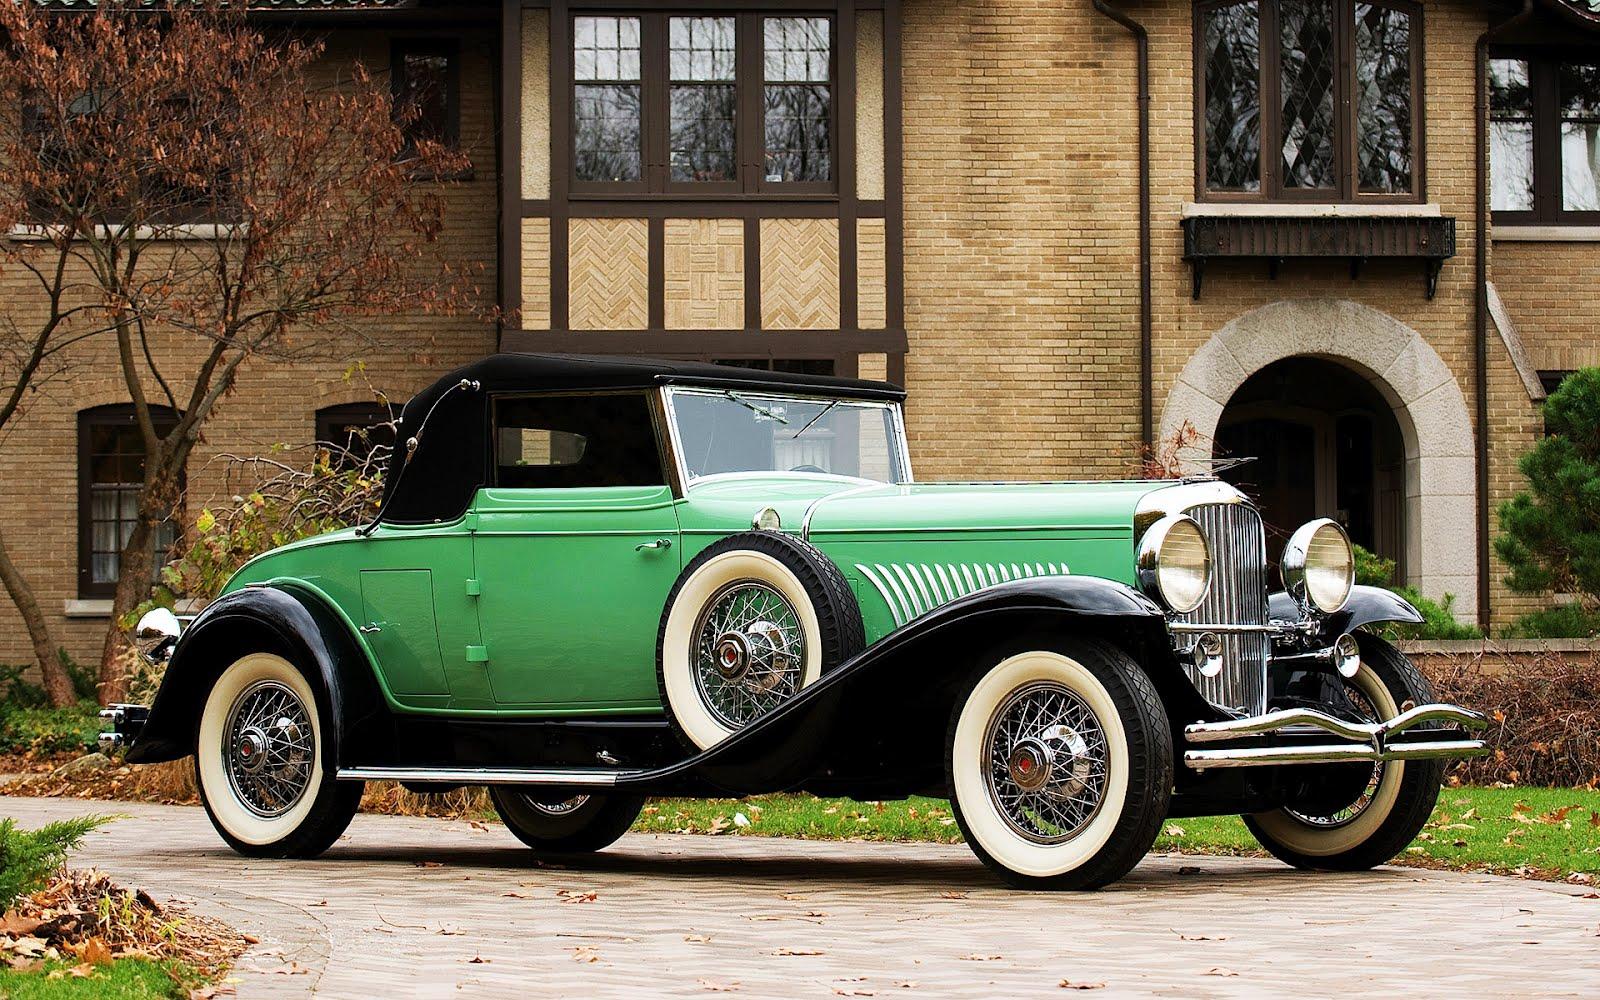 http://4.bp.blogspot.com/-8KLq8IzMjSg/UAXH9vx-tGI/AAAAAAABAW4/2LFaQiMyJOQ/s1600/duesenberg-j-417-convertible-coupe-1920x1200-wallpaper-autos-antiguos.jpg